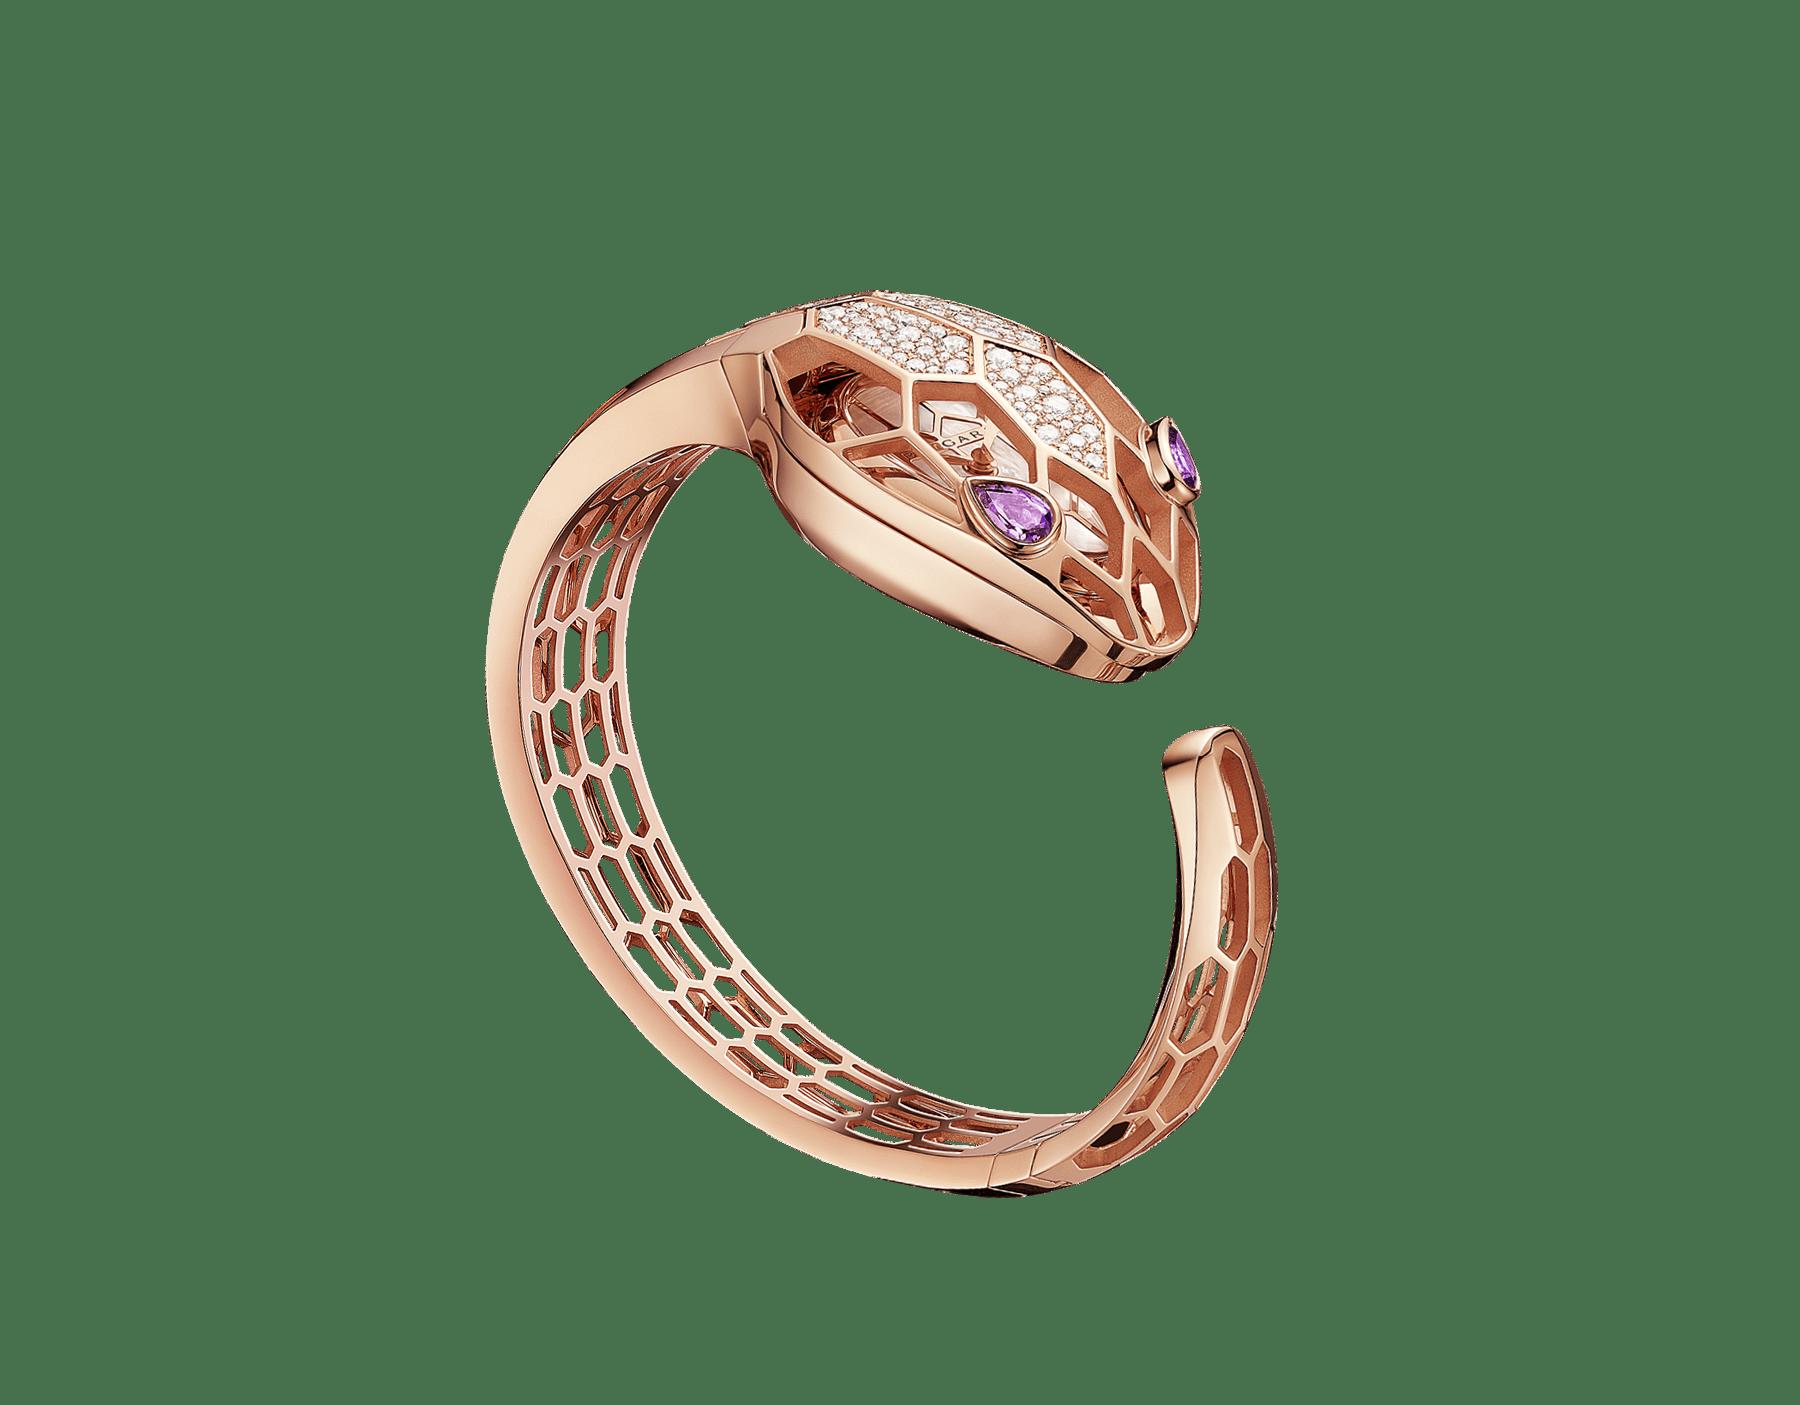 Serpenti Misteriosi Secret 腕錶,18K 玫瑰金鏤空錶殼鑲飾圓形明亮型切割鑽石,白色珍珠母貝錶盤,18K 玫瑰金鏤空手鐲式錶帶,蛇眼鑲飾梨形紫水晶。M 尺寸。 SrpntMister-SecretWtc-rose-gold image 8